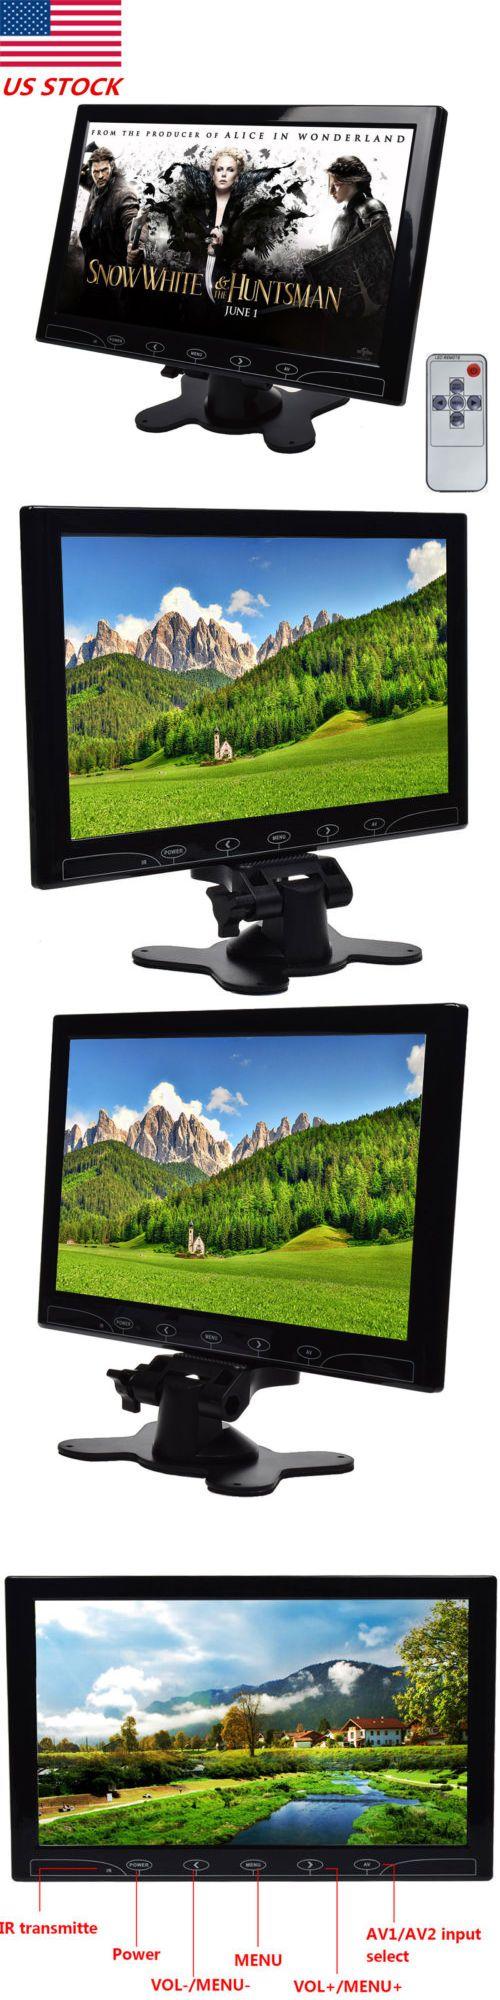 Surveillance Monitors Displays: 10.1 10 Inch Surveillance Pc Cctv Monitor Hdmi Vga Av Input Built-In Speaker Us -> BUY IT NOW ONLY: $73.5 on eBay!